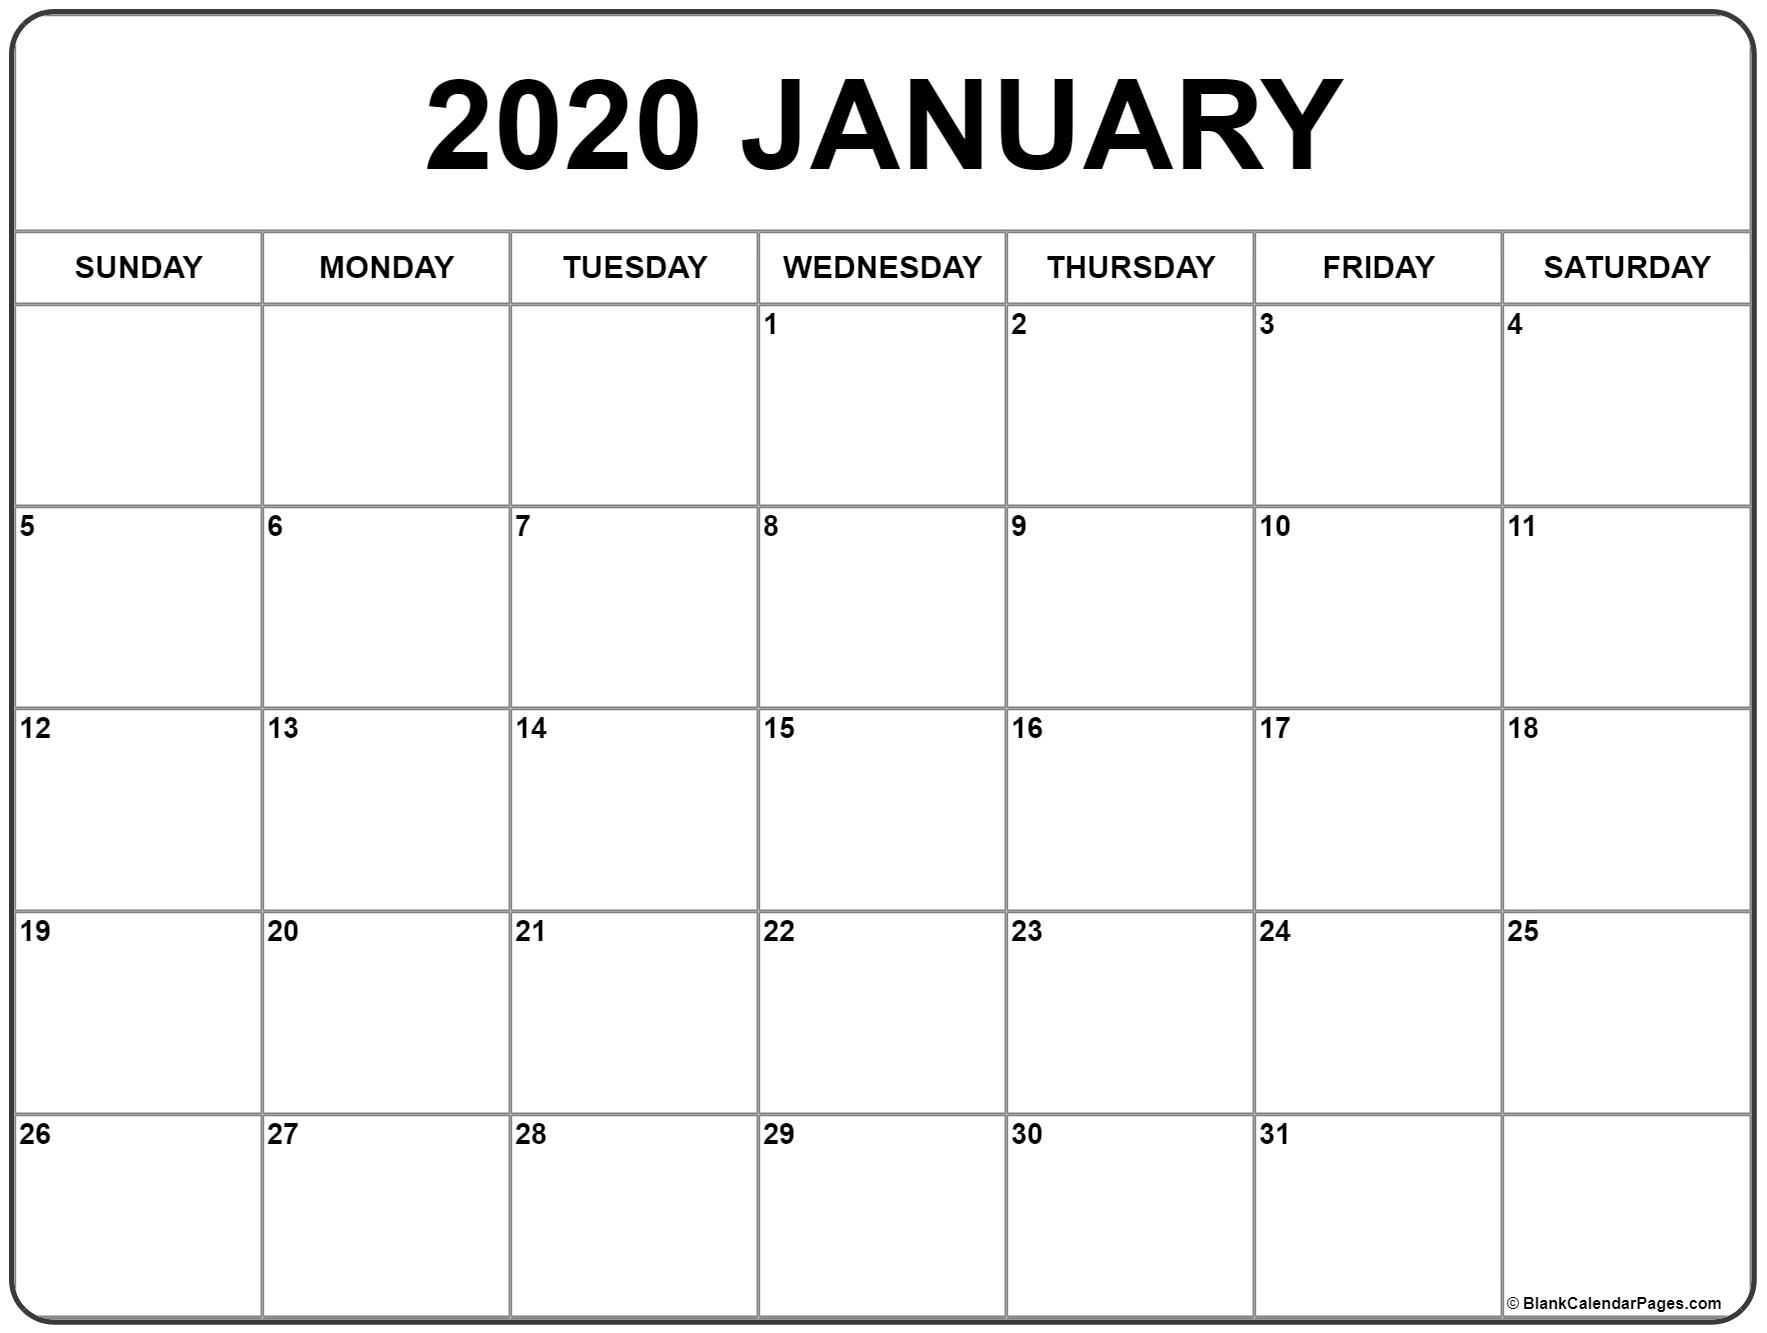 January 2020 Calendar | Free Printable Monthly Calendars-Blank Printable Calendar July And August 2020